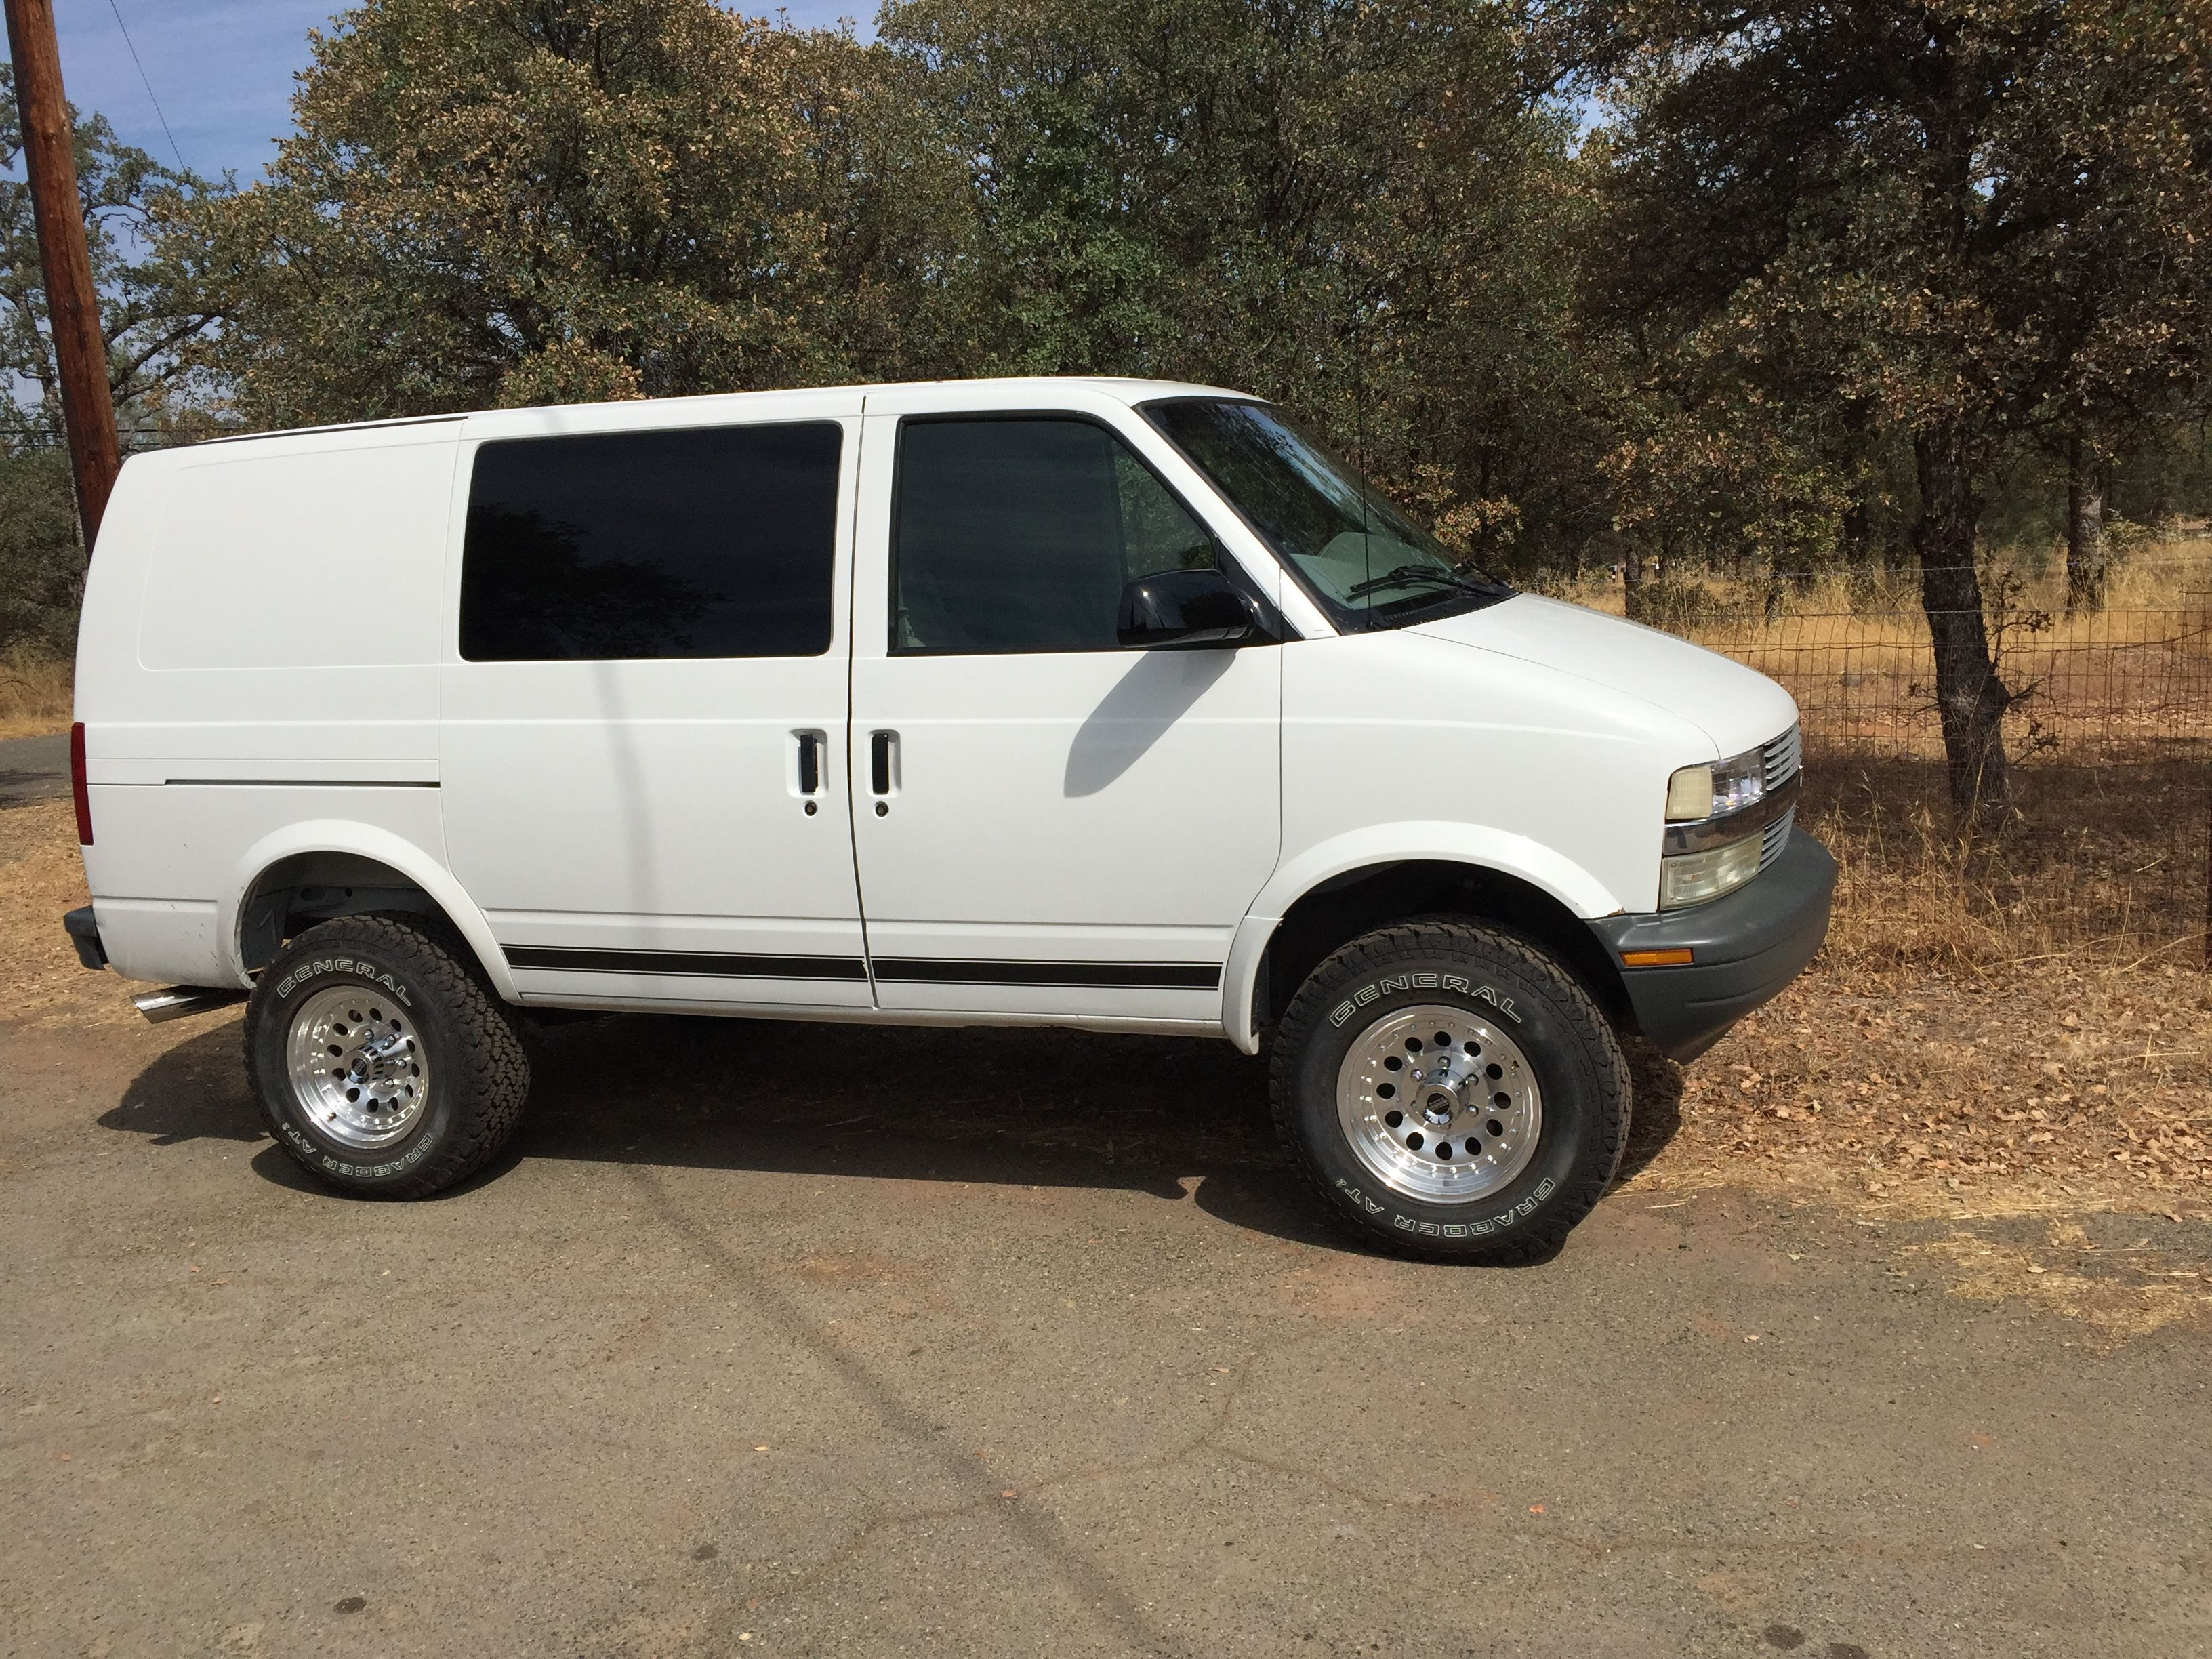 2003 Chevy Astro Cargo Awd Astro Van Camper Ideas Pinterest